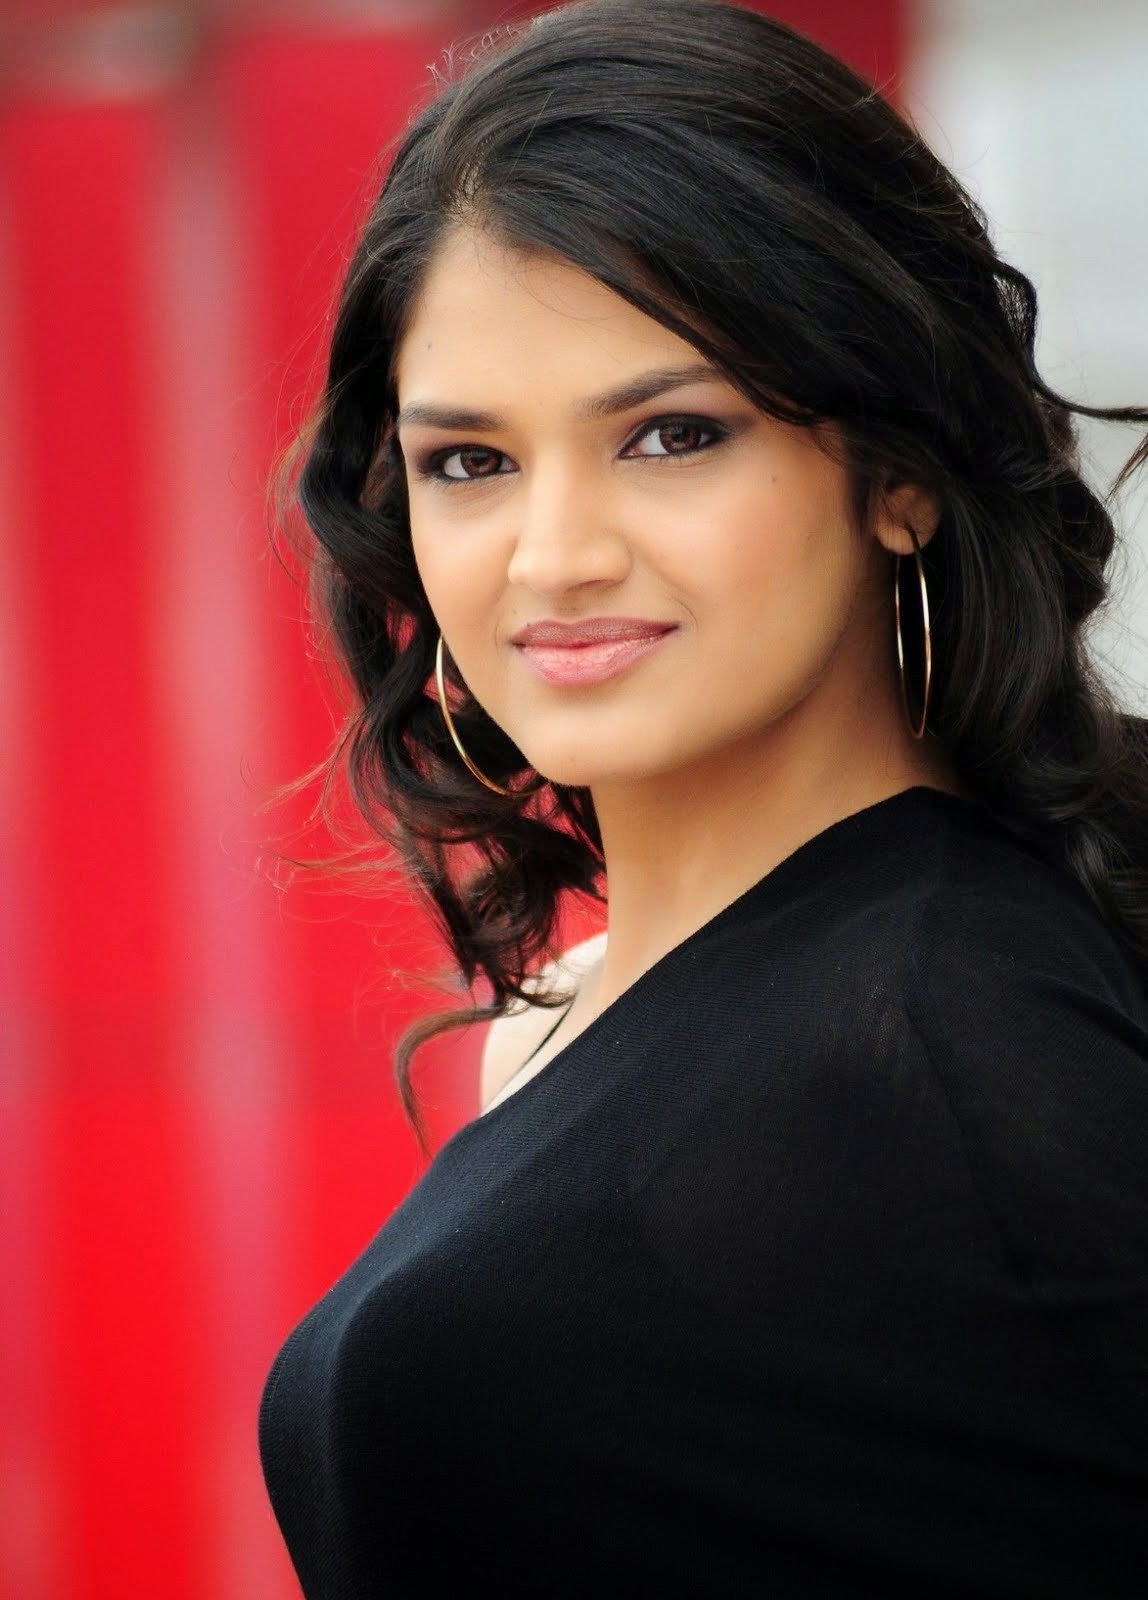 Latest Hd Mobile Wallpapers Indian Actress Tara Alisha Hd Mobile